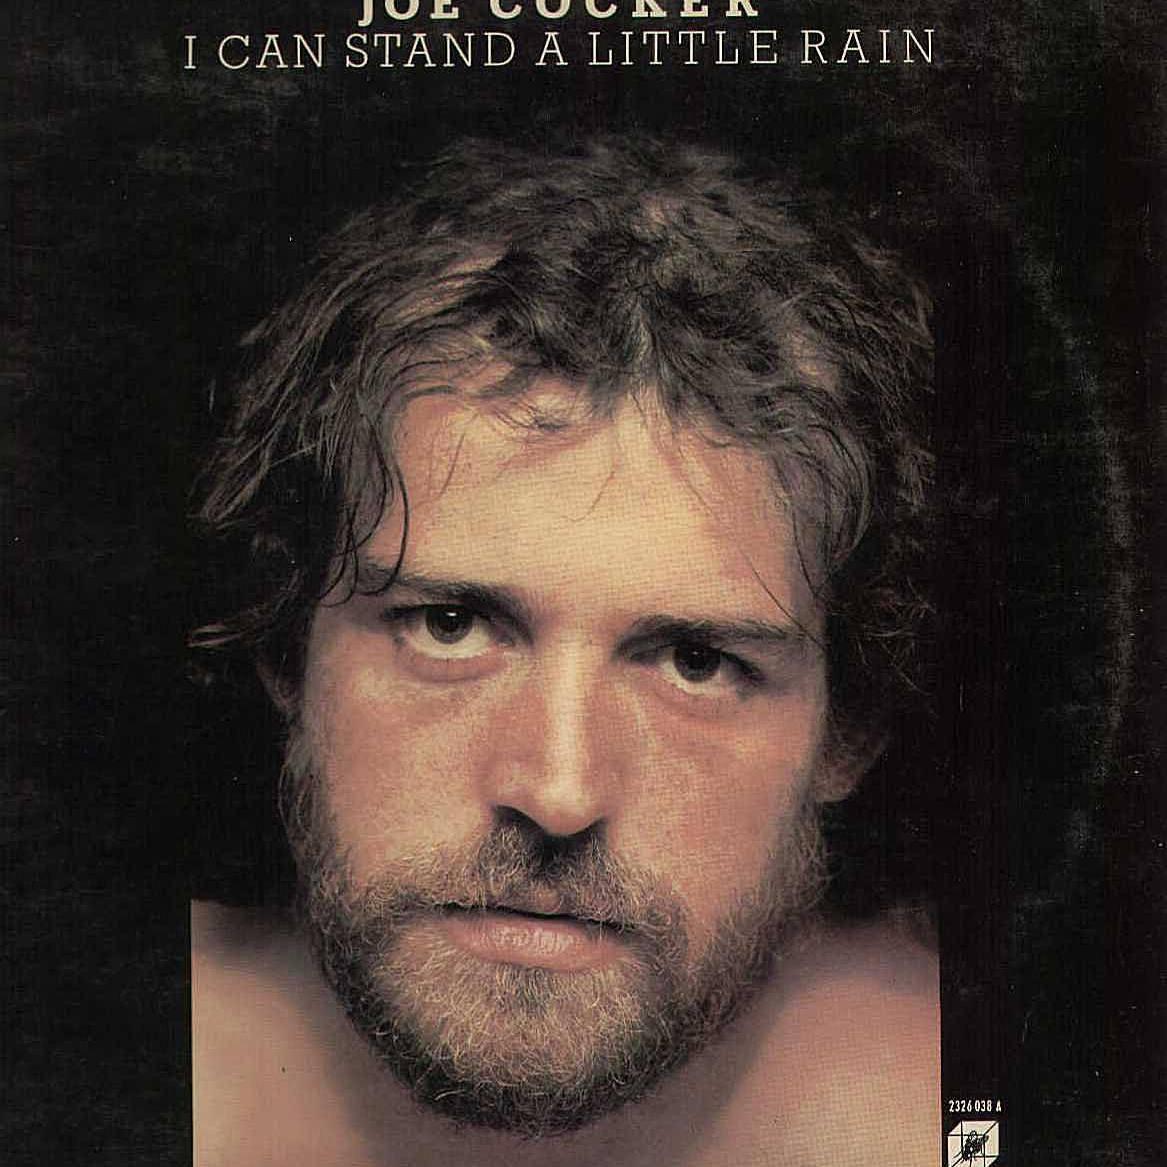 Joe Cocker album cover